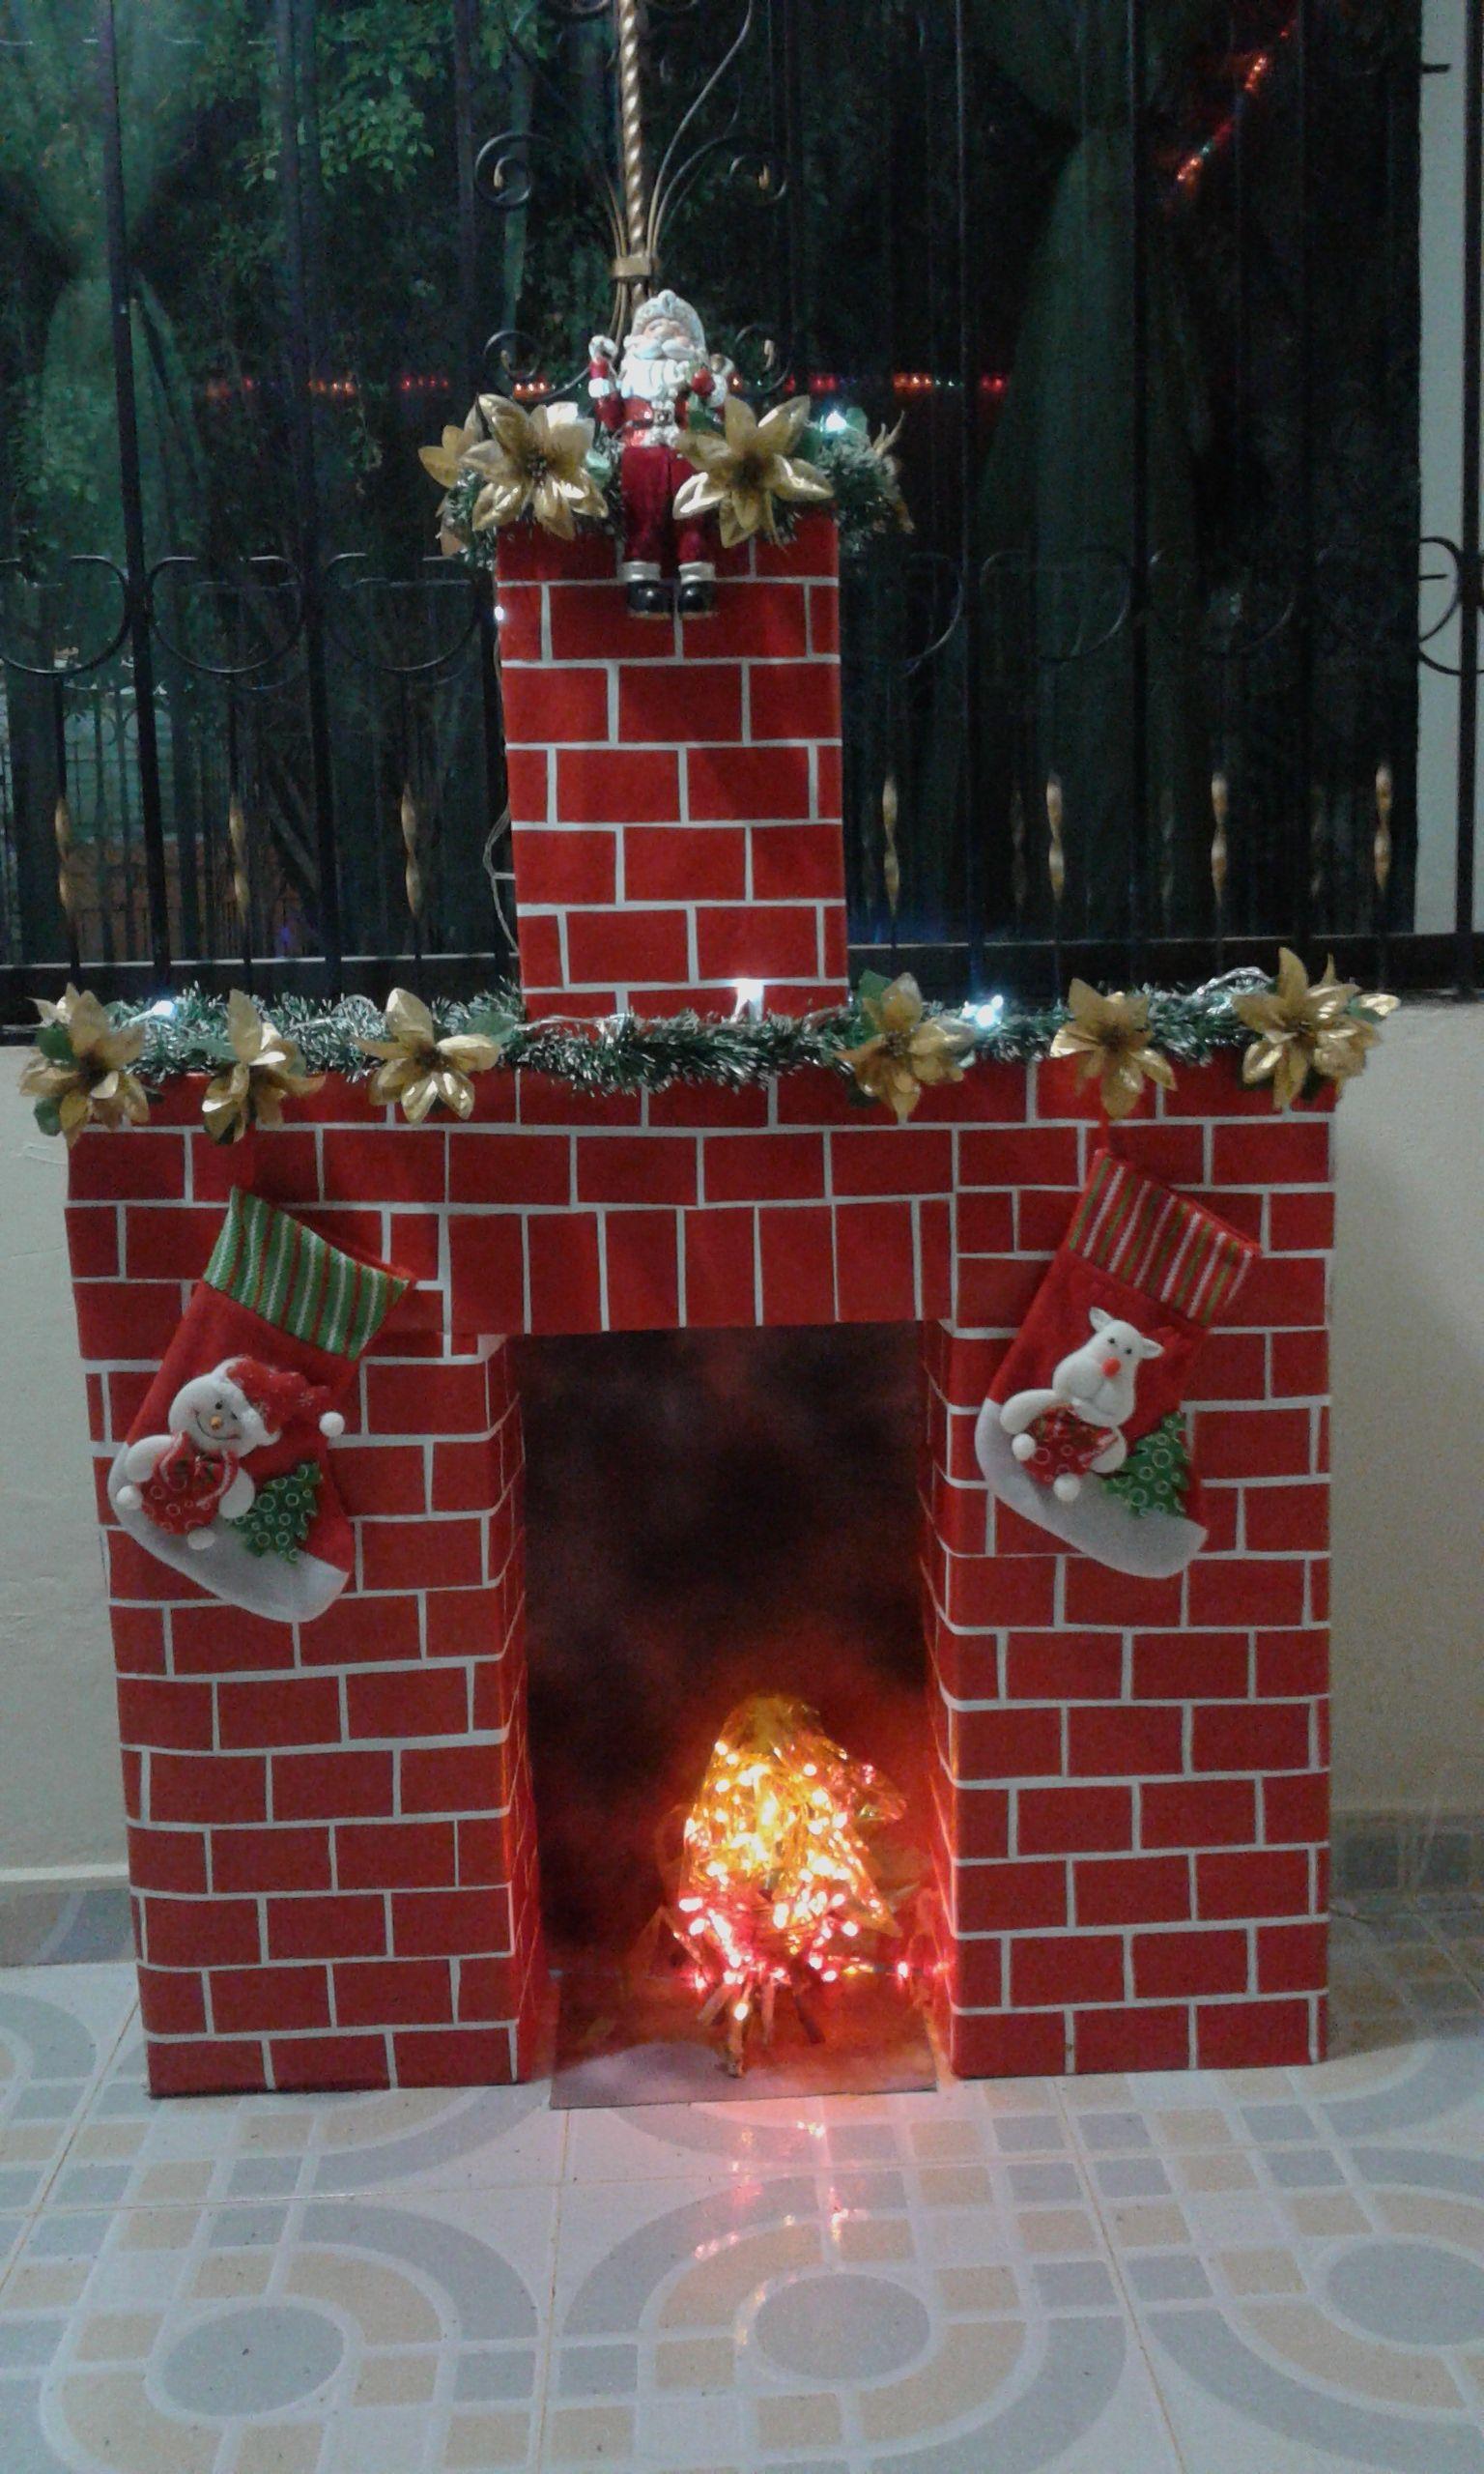 Chimenea cajas de cart n christmas chimeneas - Chimeneas para decorar ...